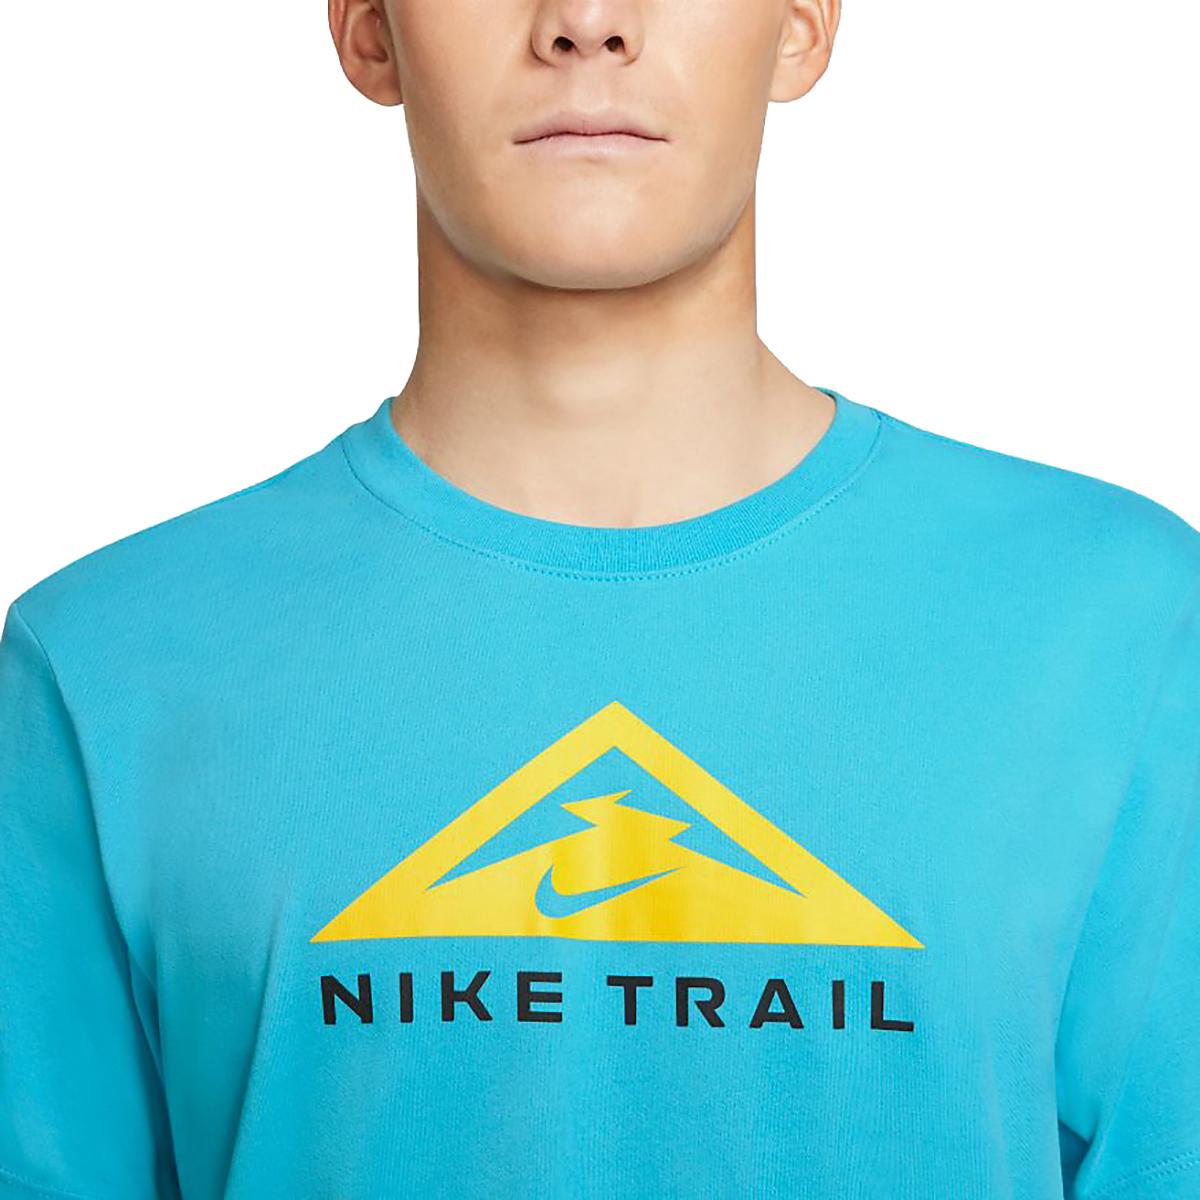 Men's Nike Dri-FIT Short-Sleeve Trail Running T-Shirt - Color: Chlorine Blue - Size: XS, Chlorine Blue, large, image 3